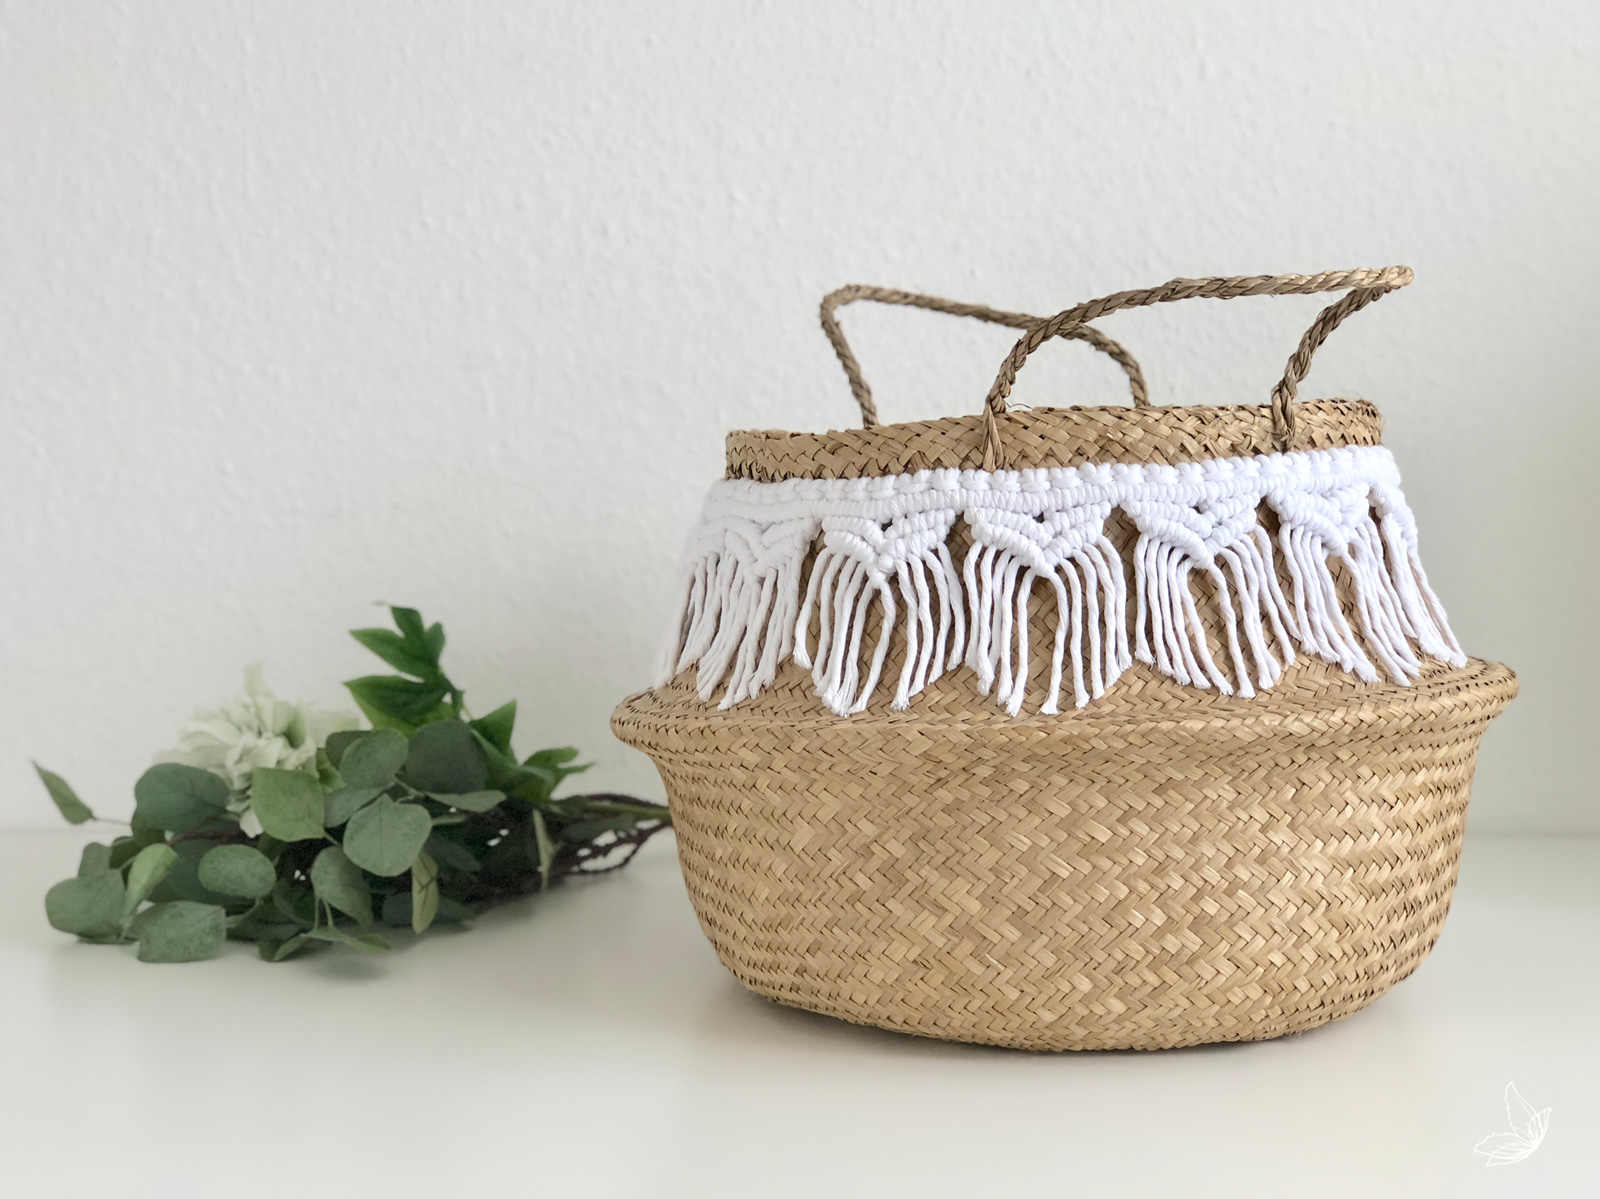 Boho Home, Ikea Hack, Macramee, Macramé, Seegraskorb, Seegras, DIY